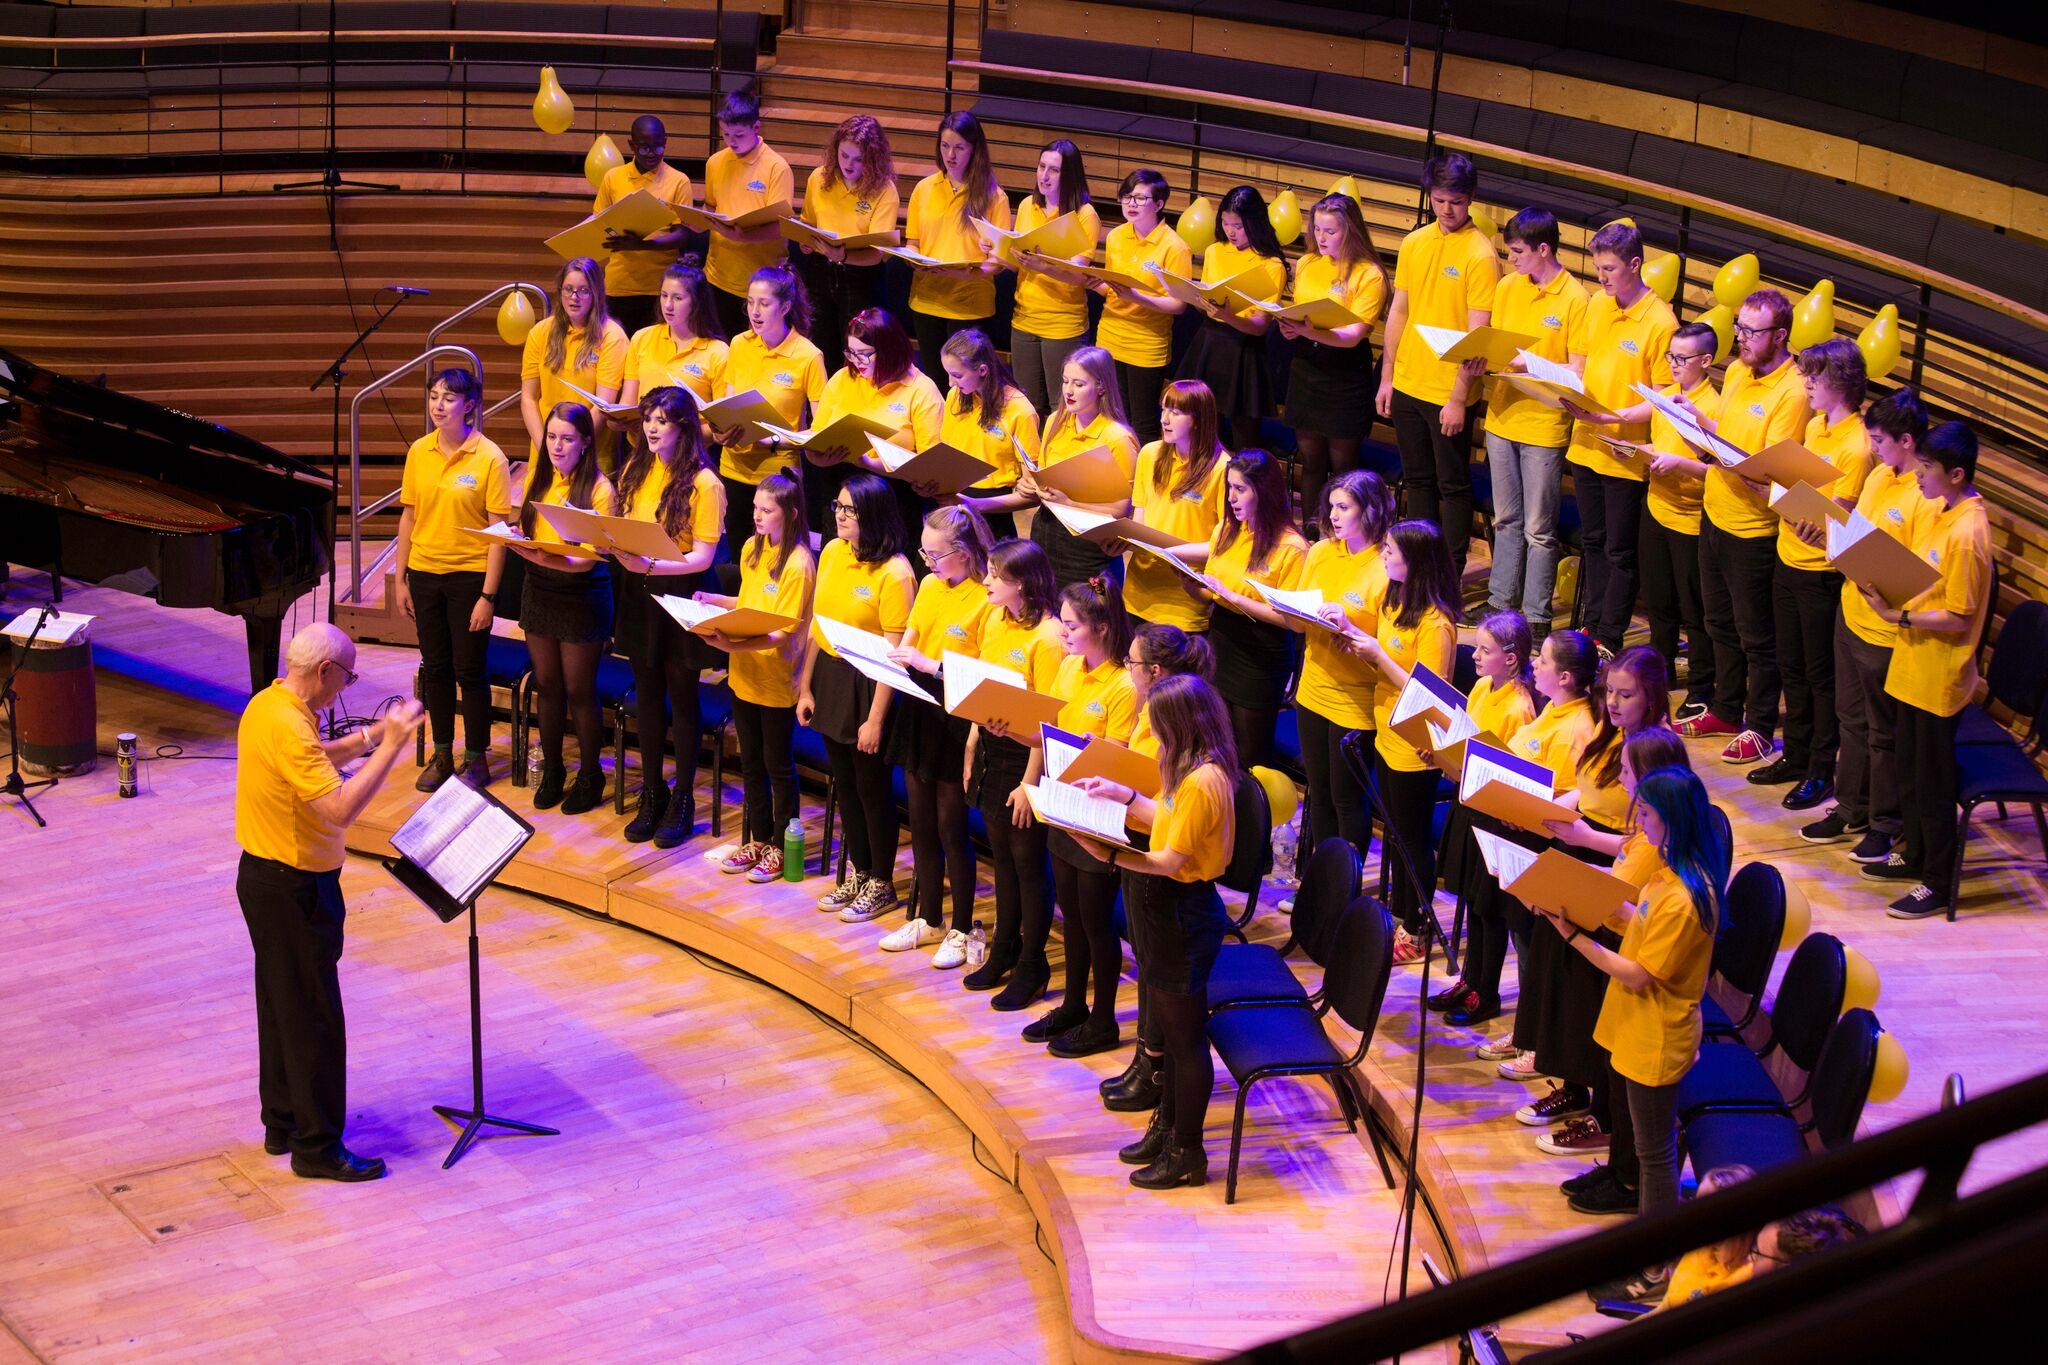 First half, the current choir